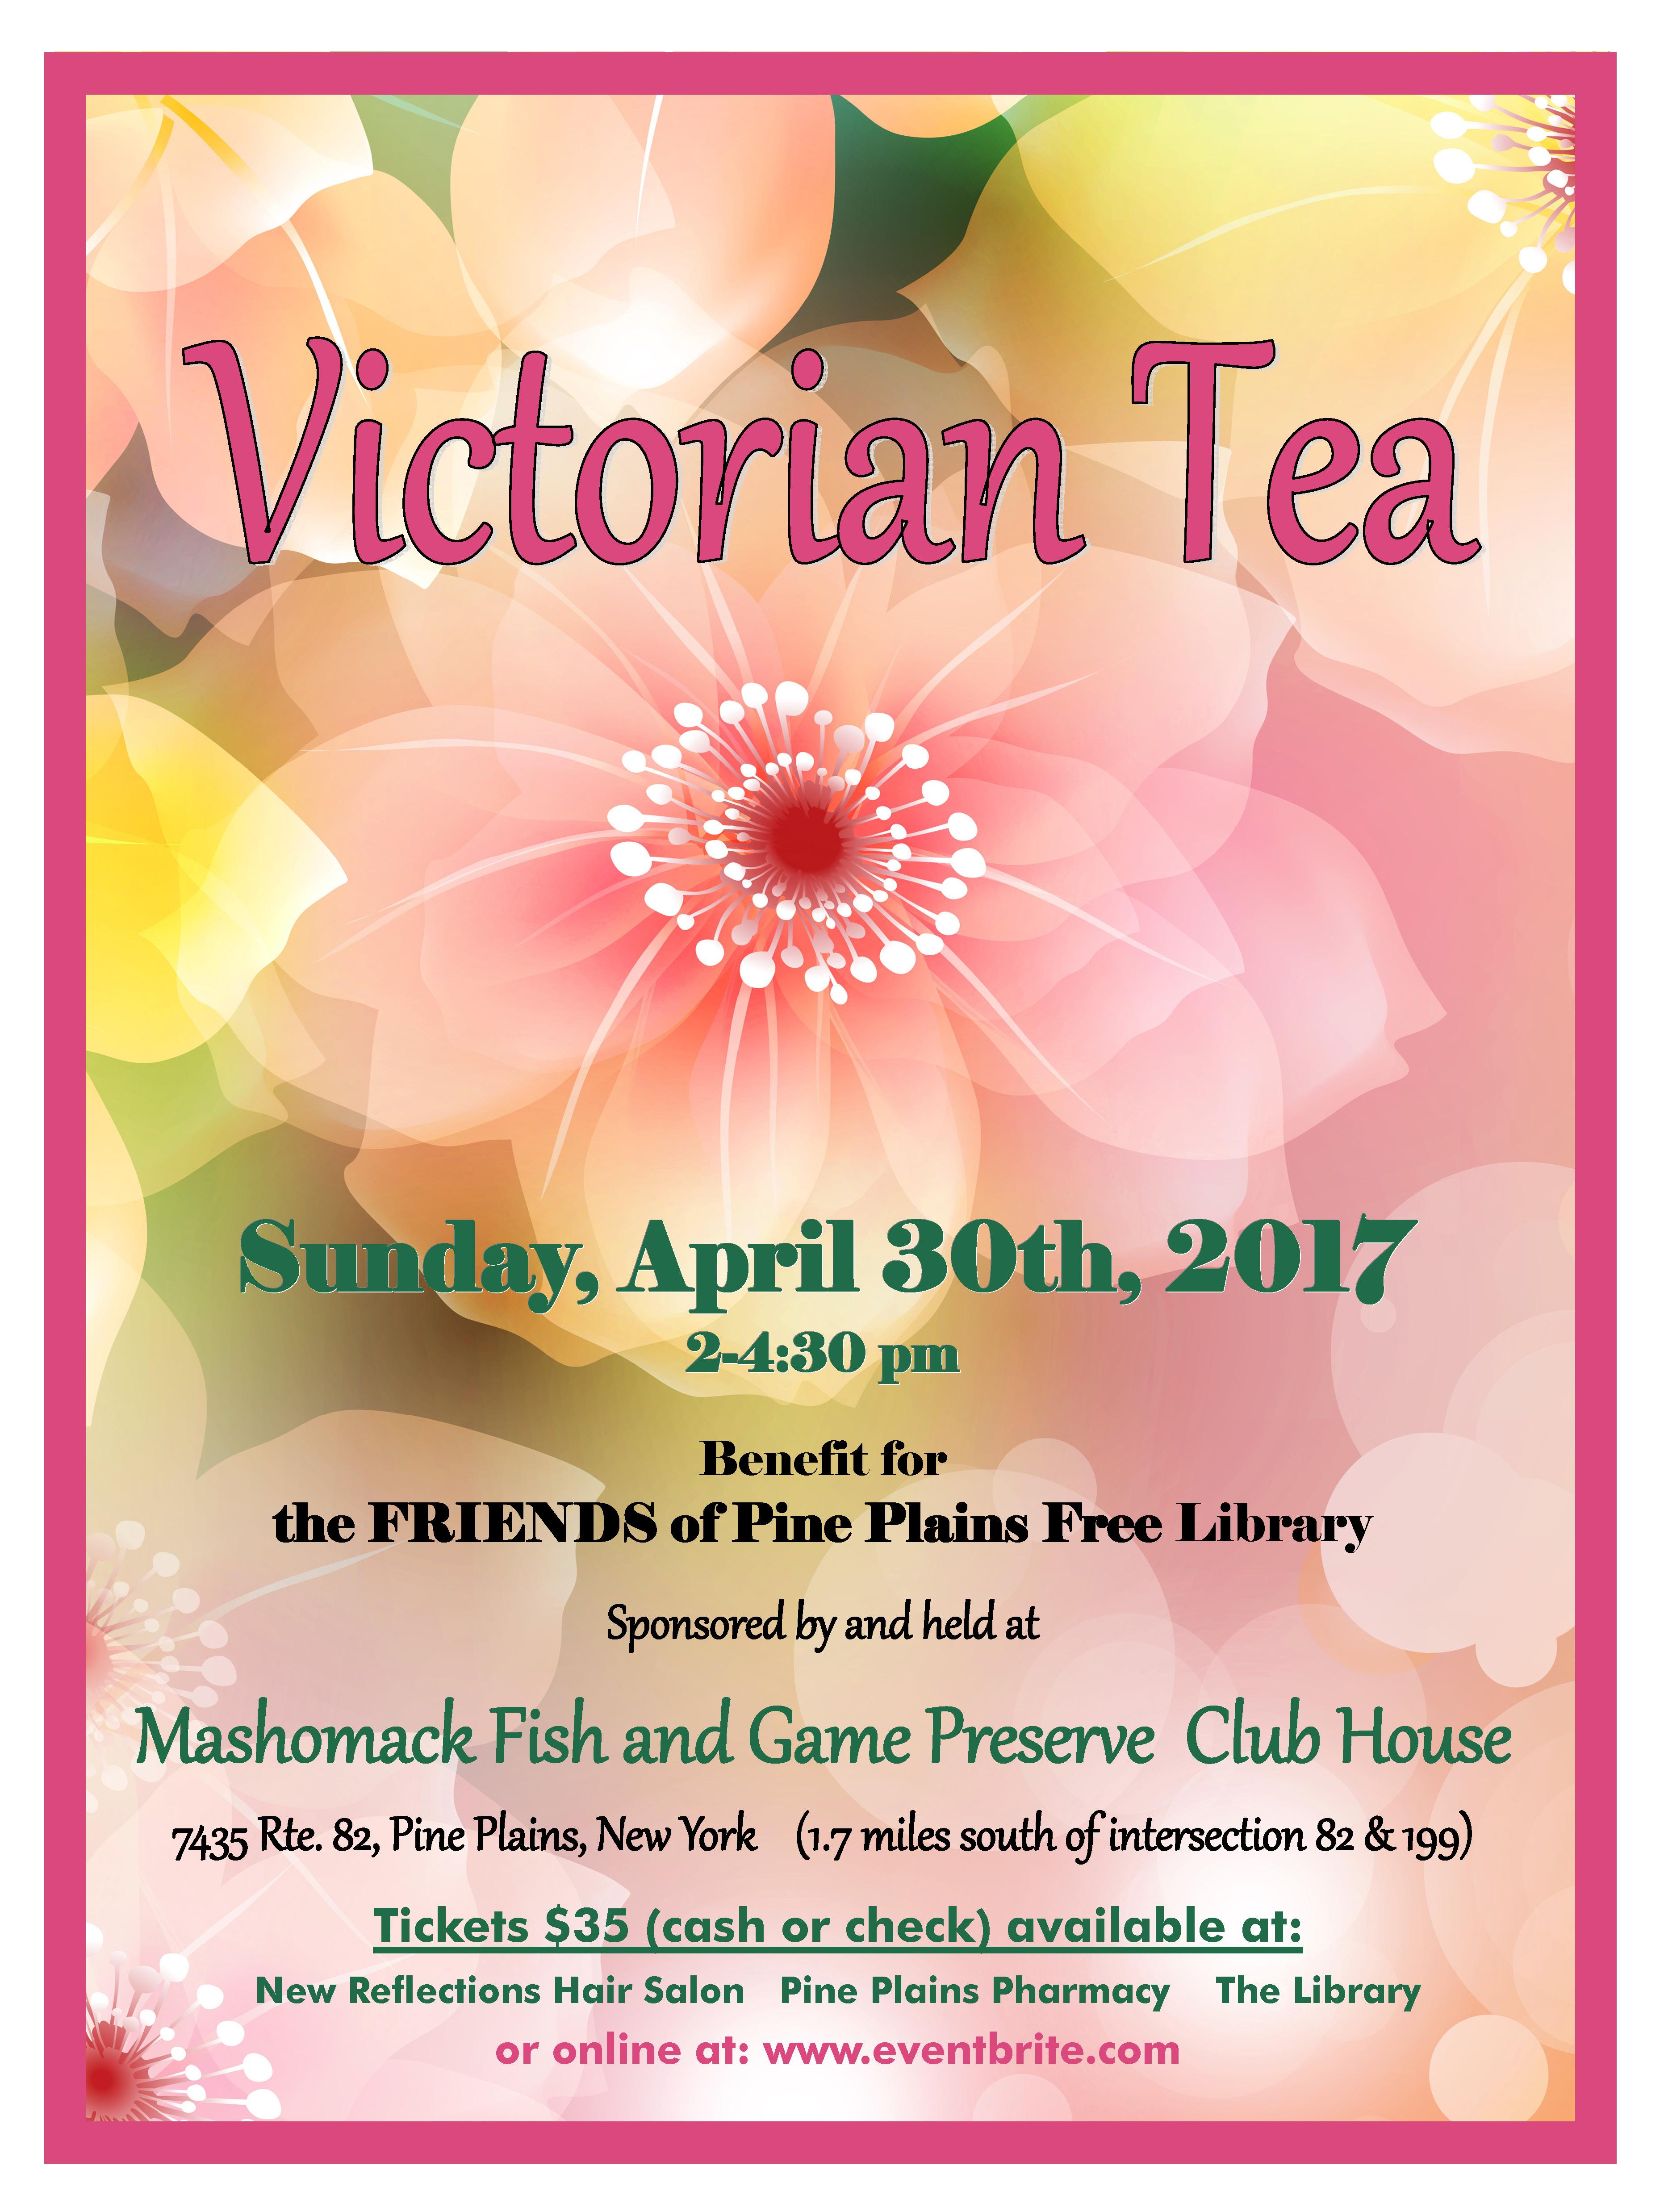 victorian-tea-2-2017-poster